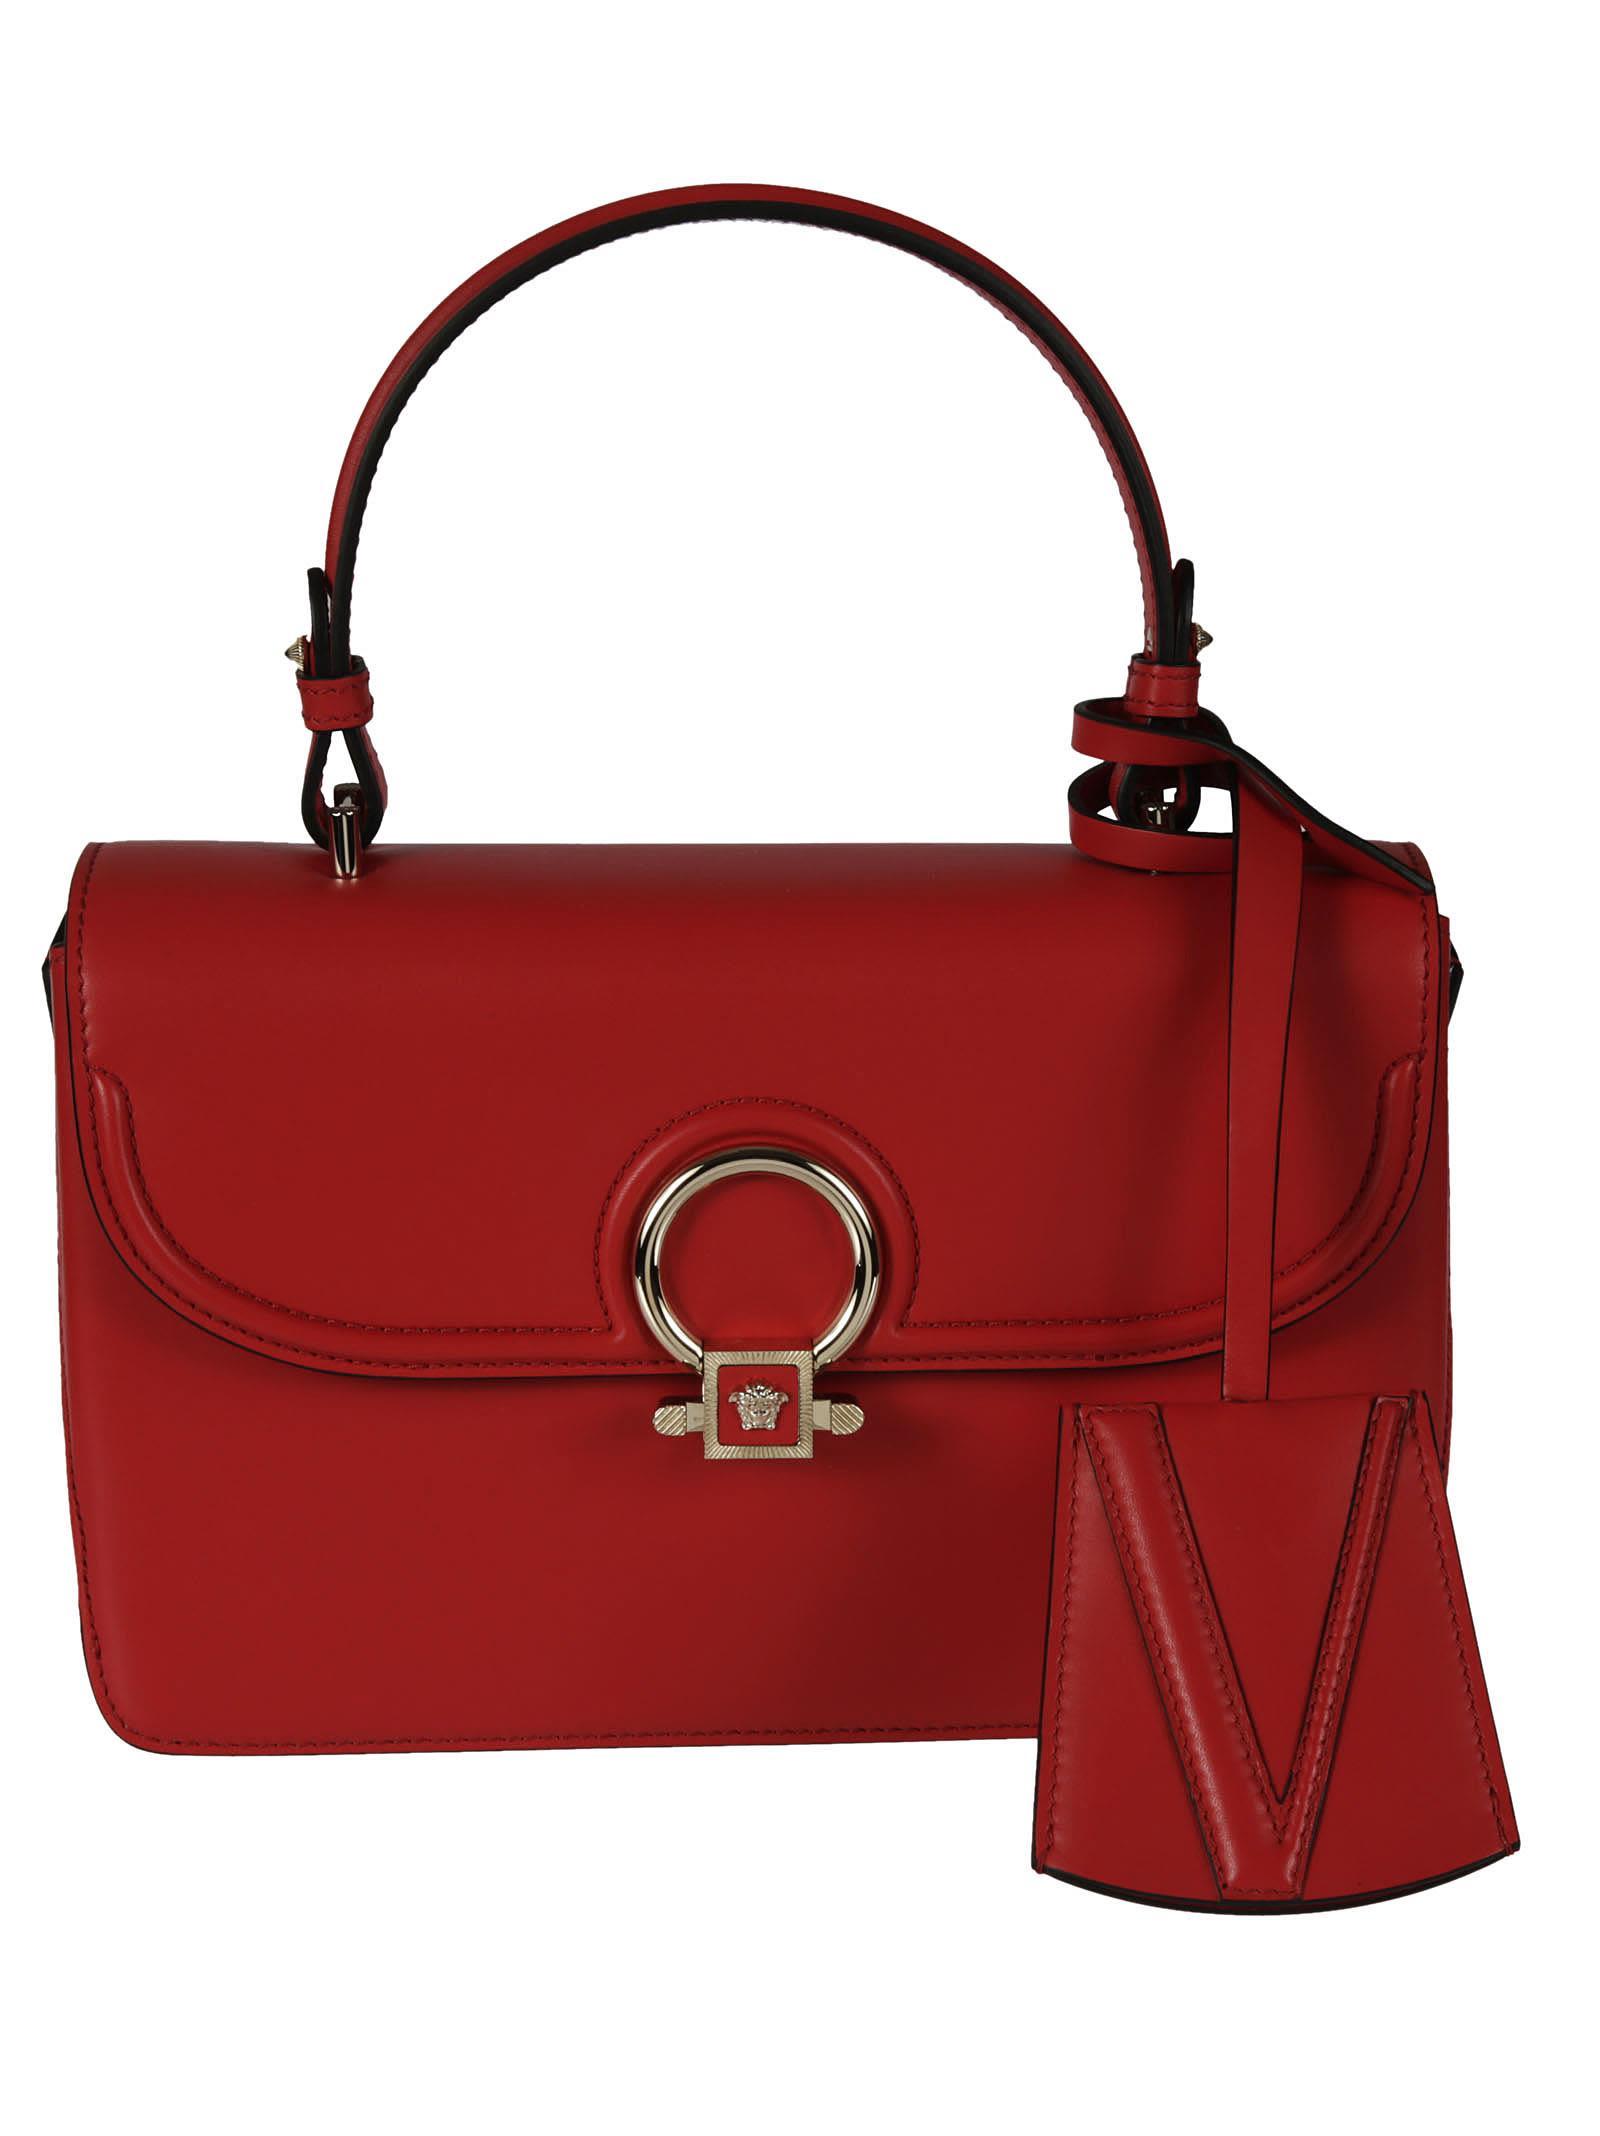 DV ONE shoulder bag - Red Versace Ql7uWTW